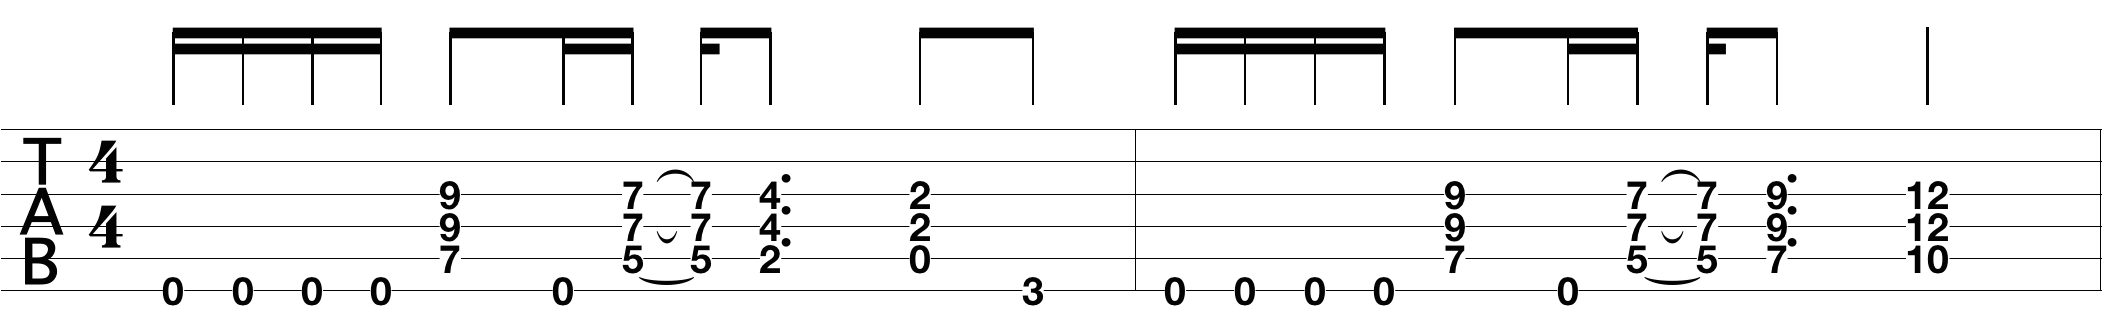 electric-guitar-riff_1.png